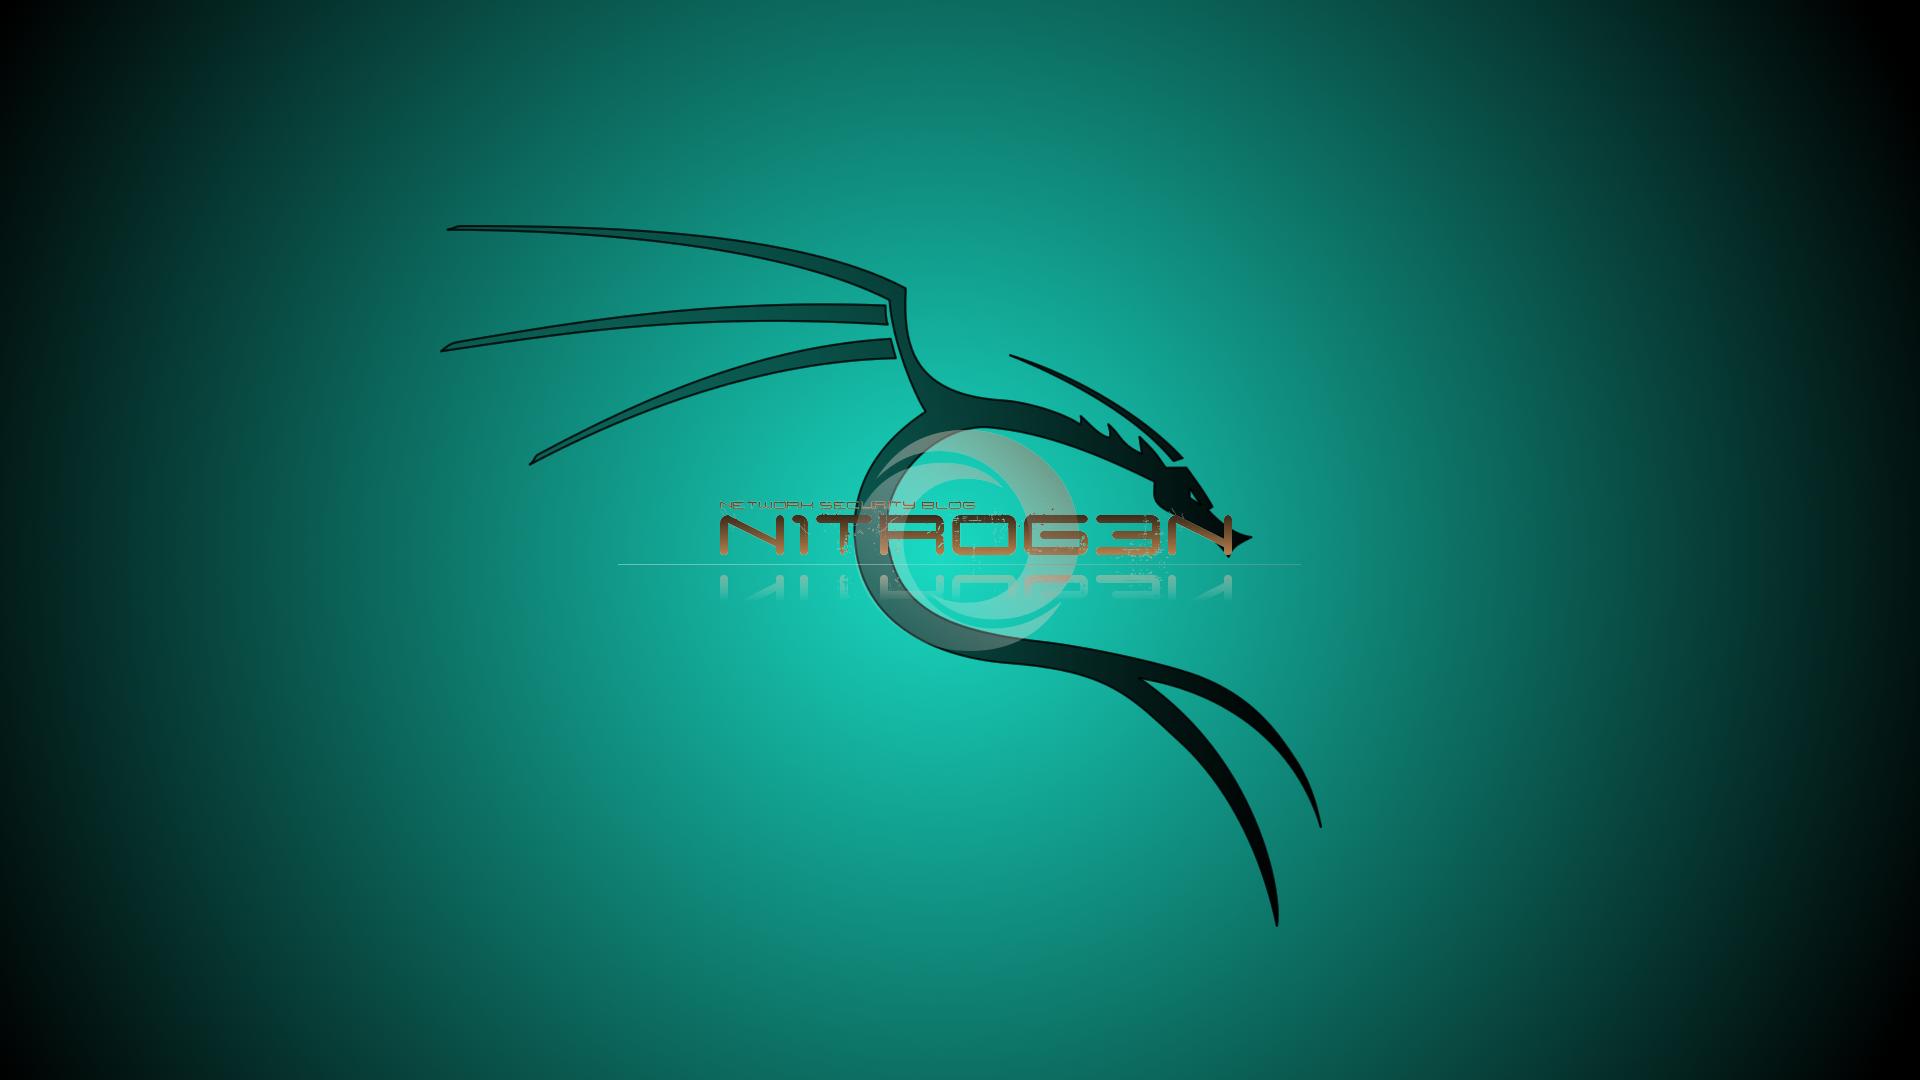 Nitrogen_1920x1080.png